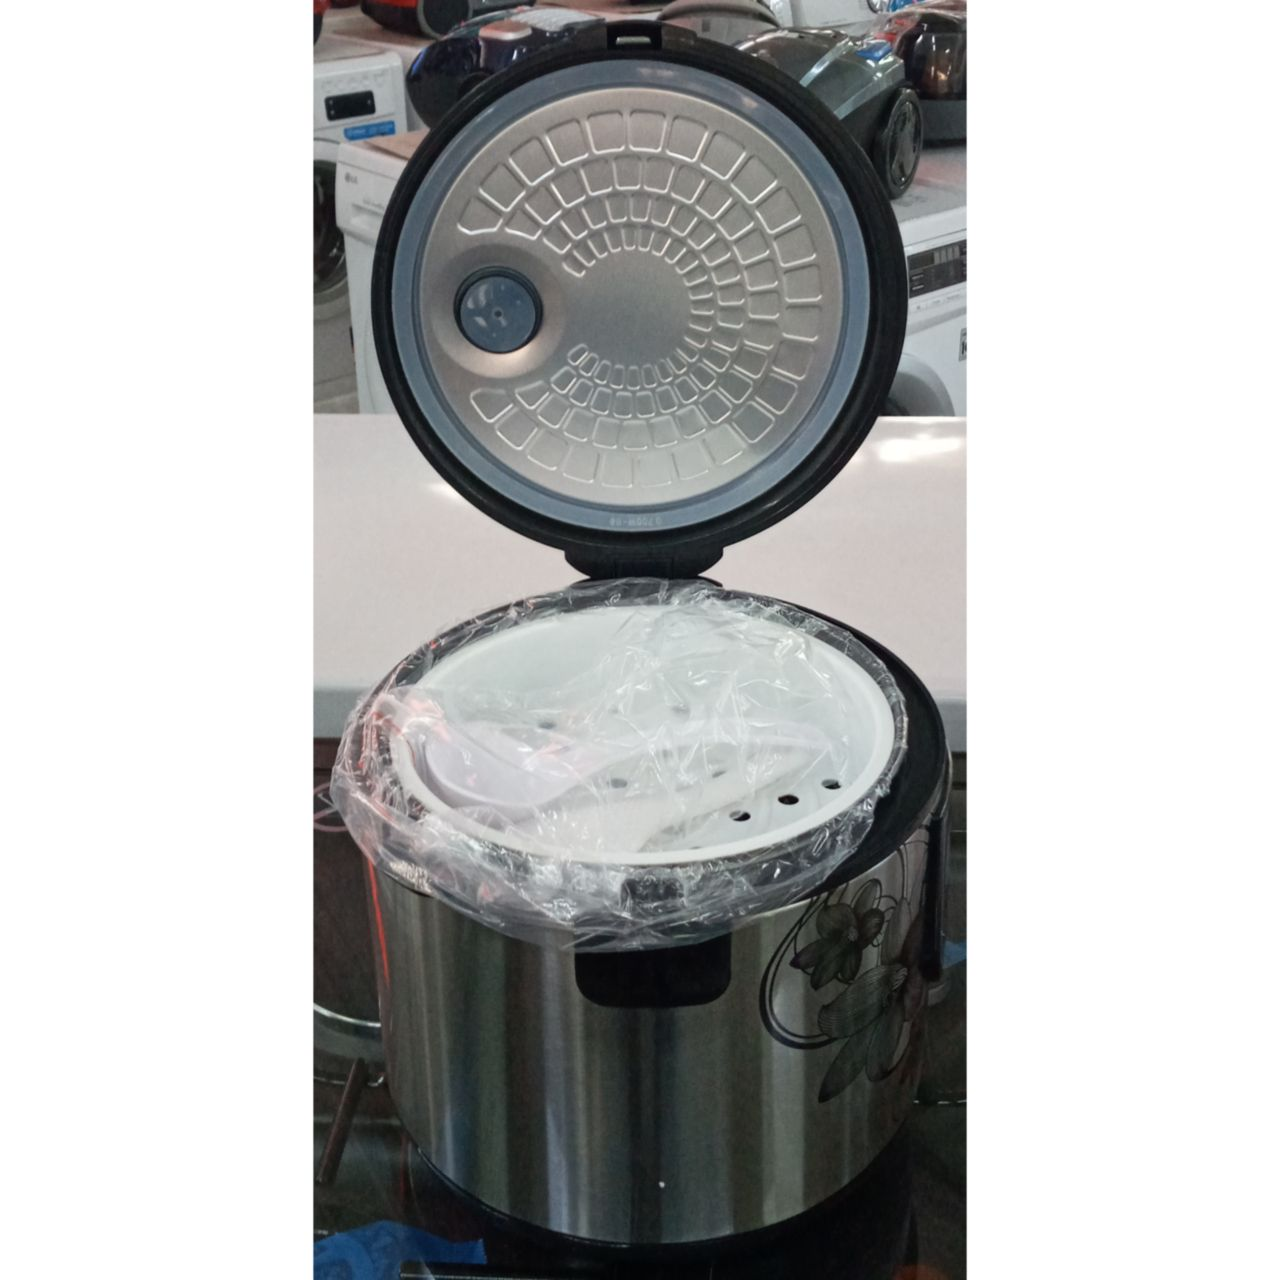 Мультиварка Centek объемом 5 литров